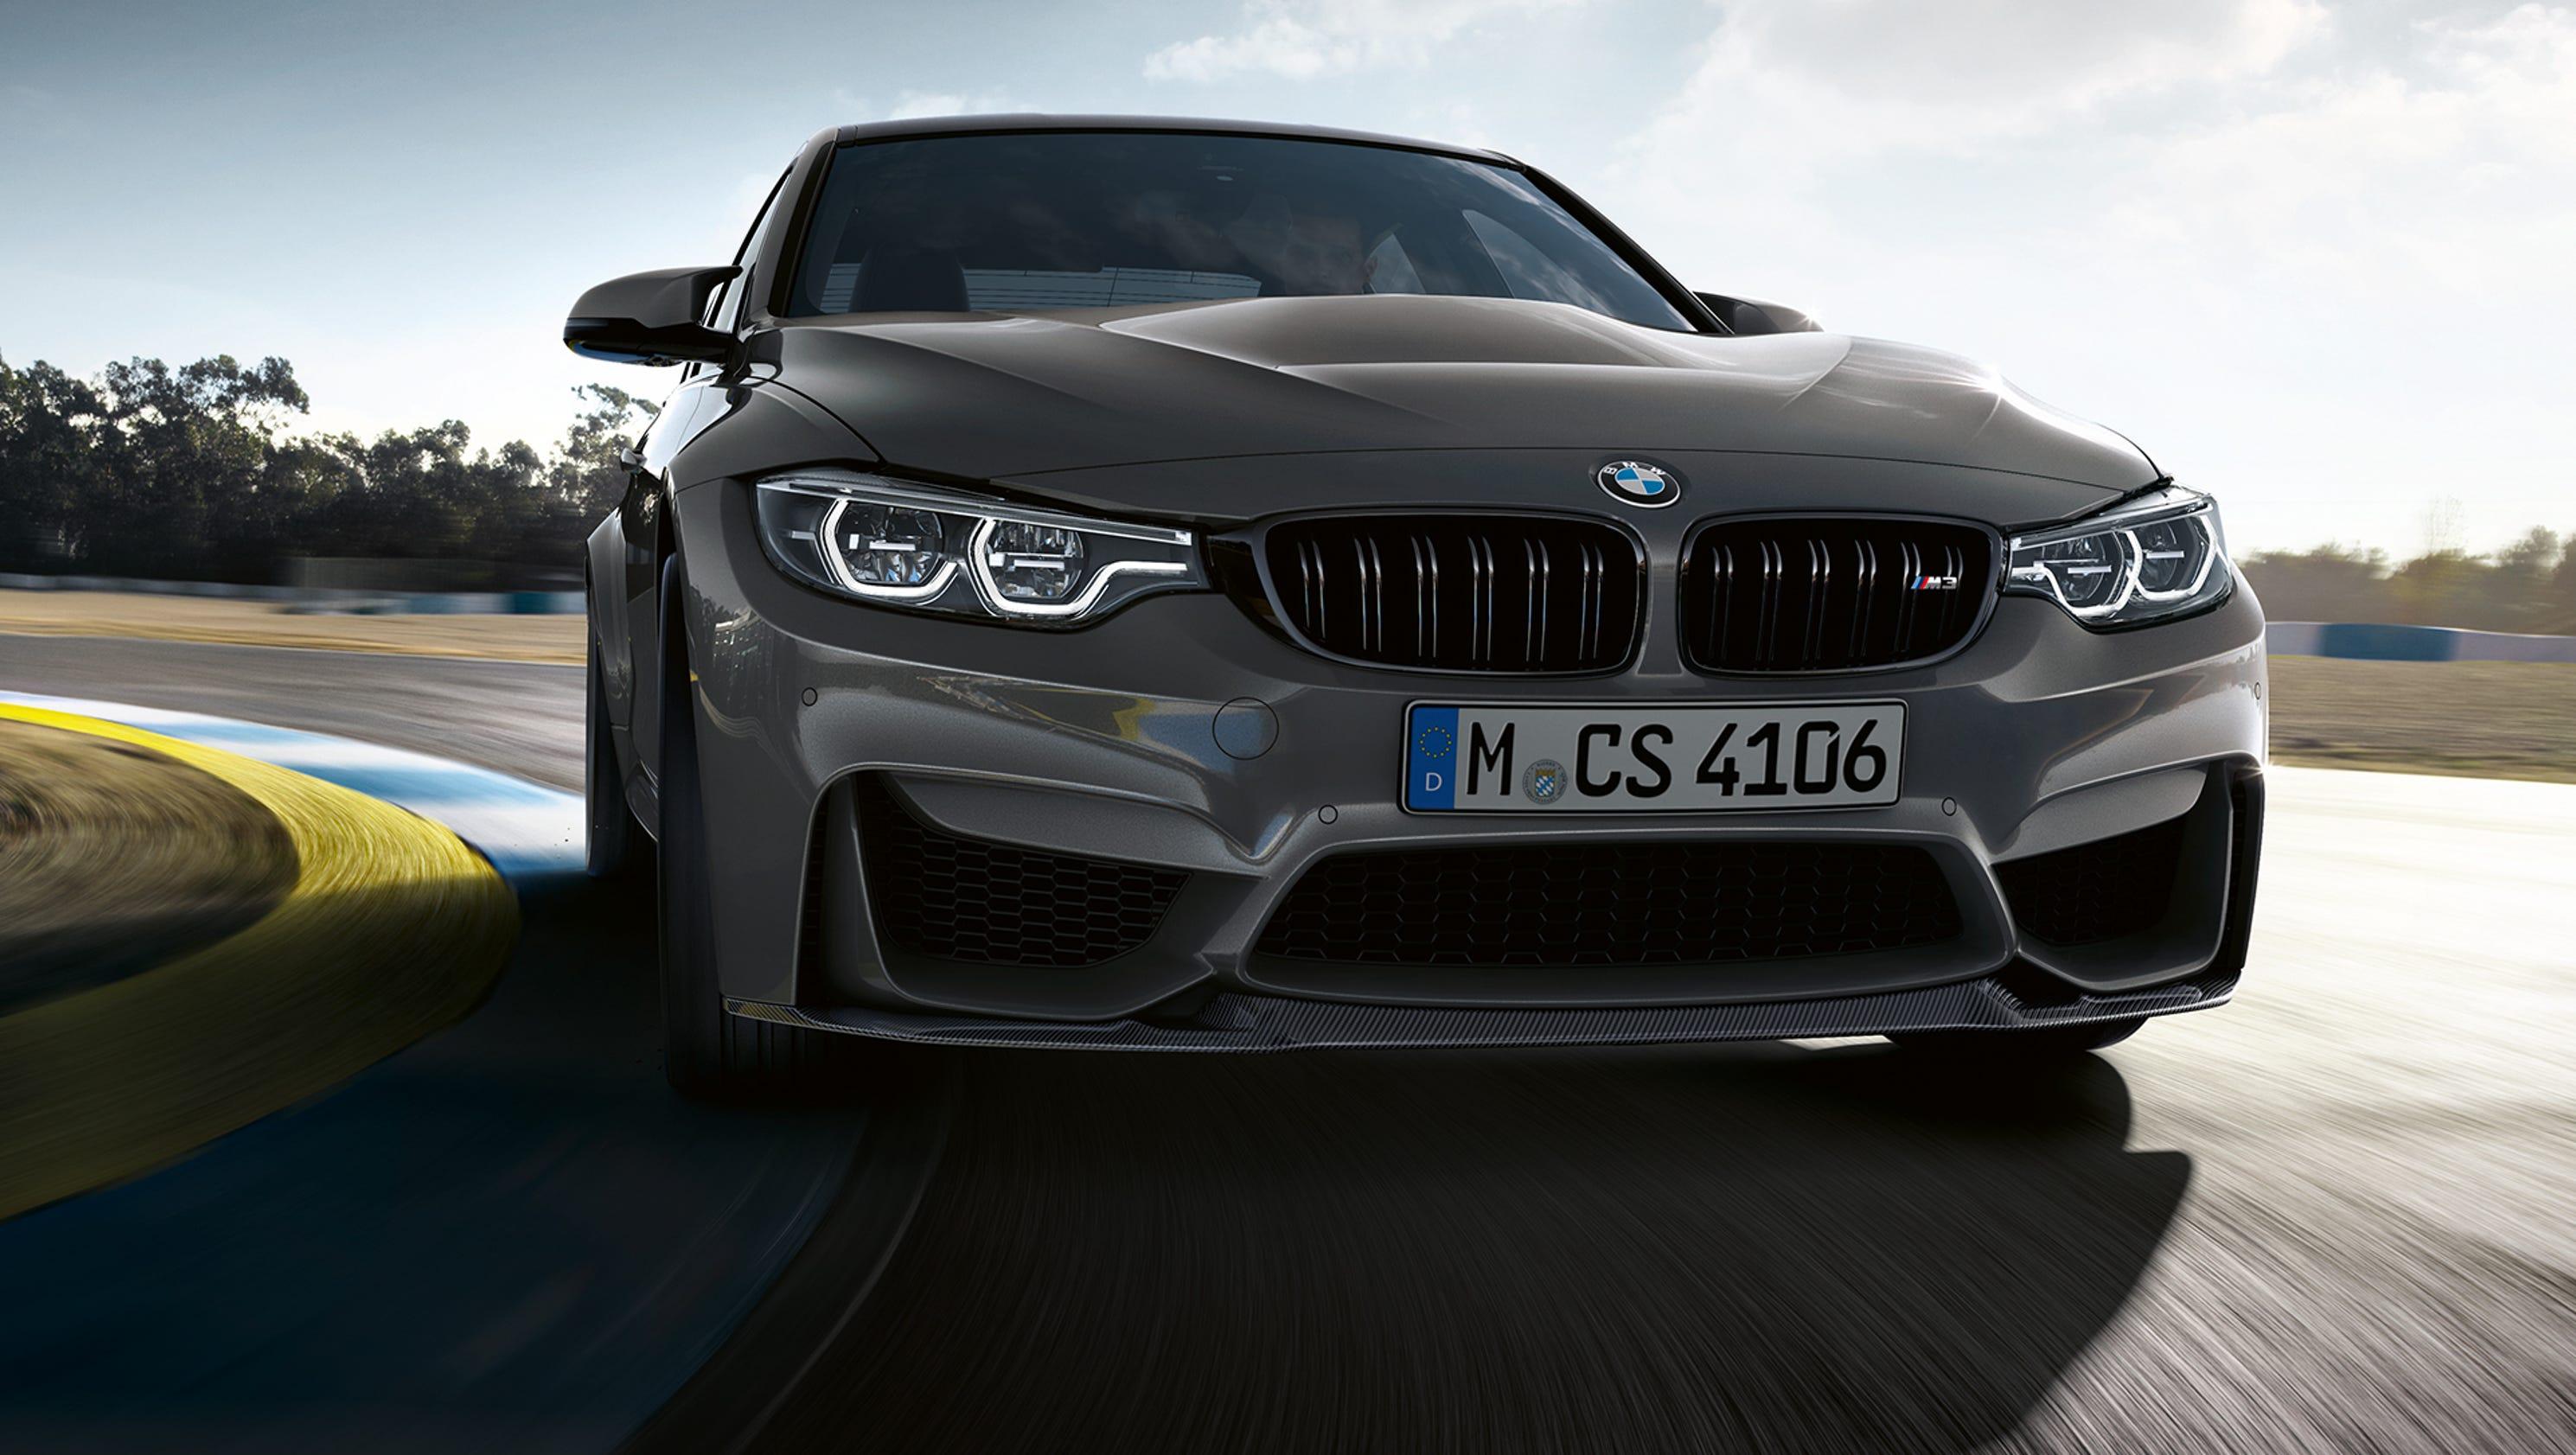 Bmw Amps Up Performance In New M3 Cs Sedan